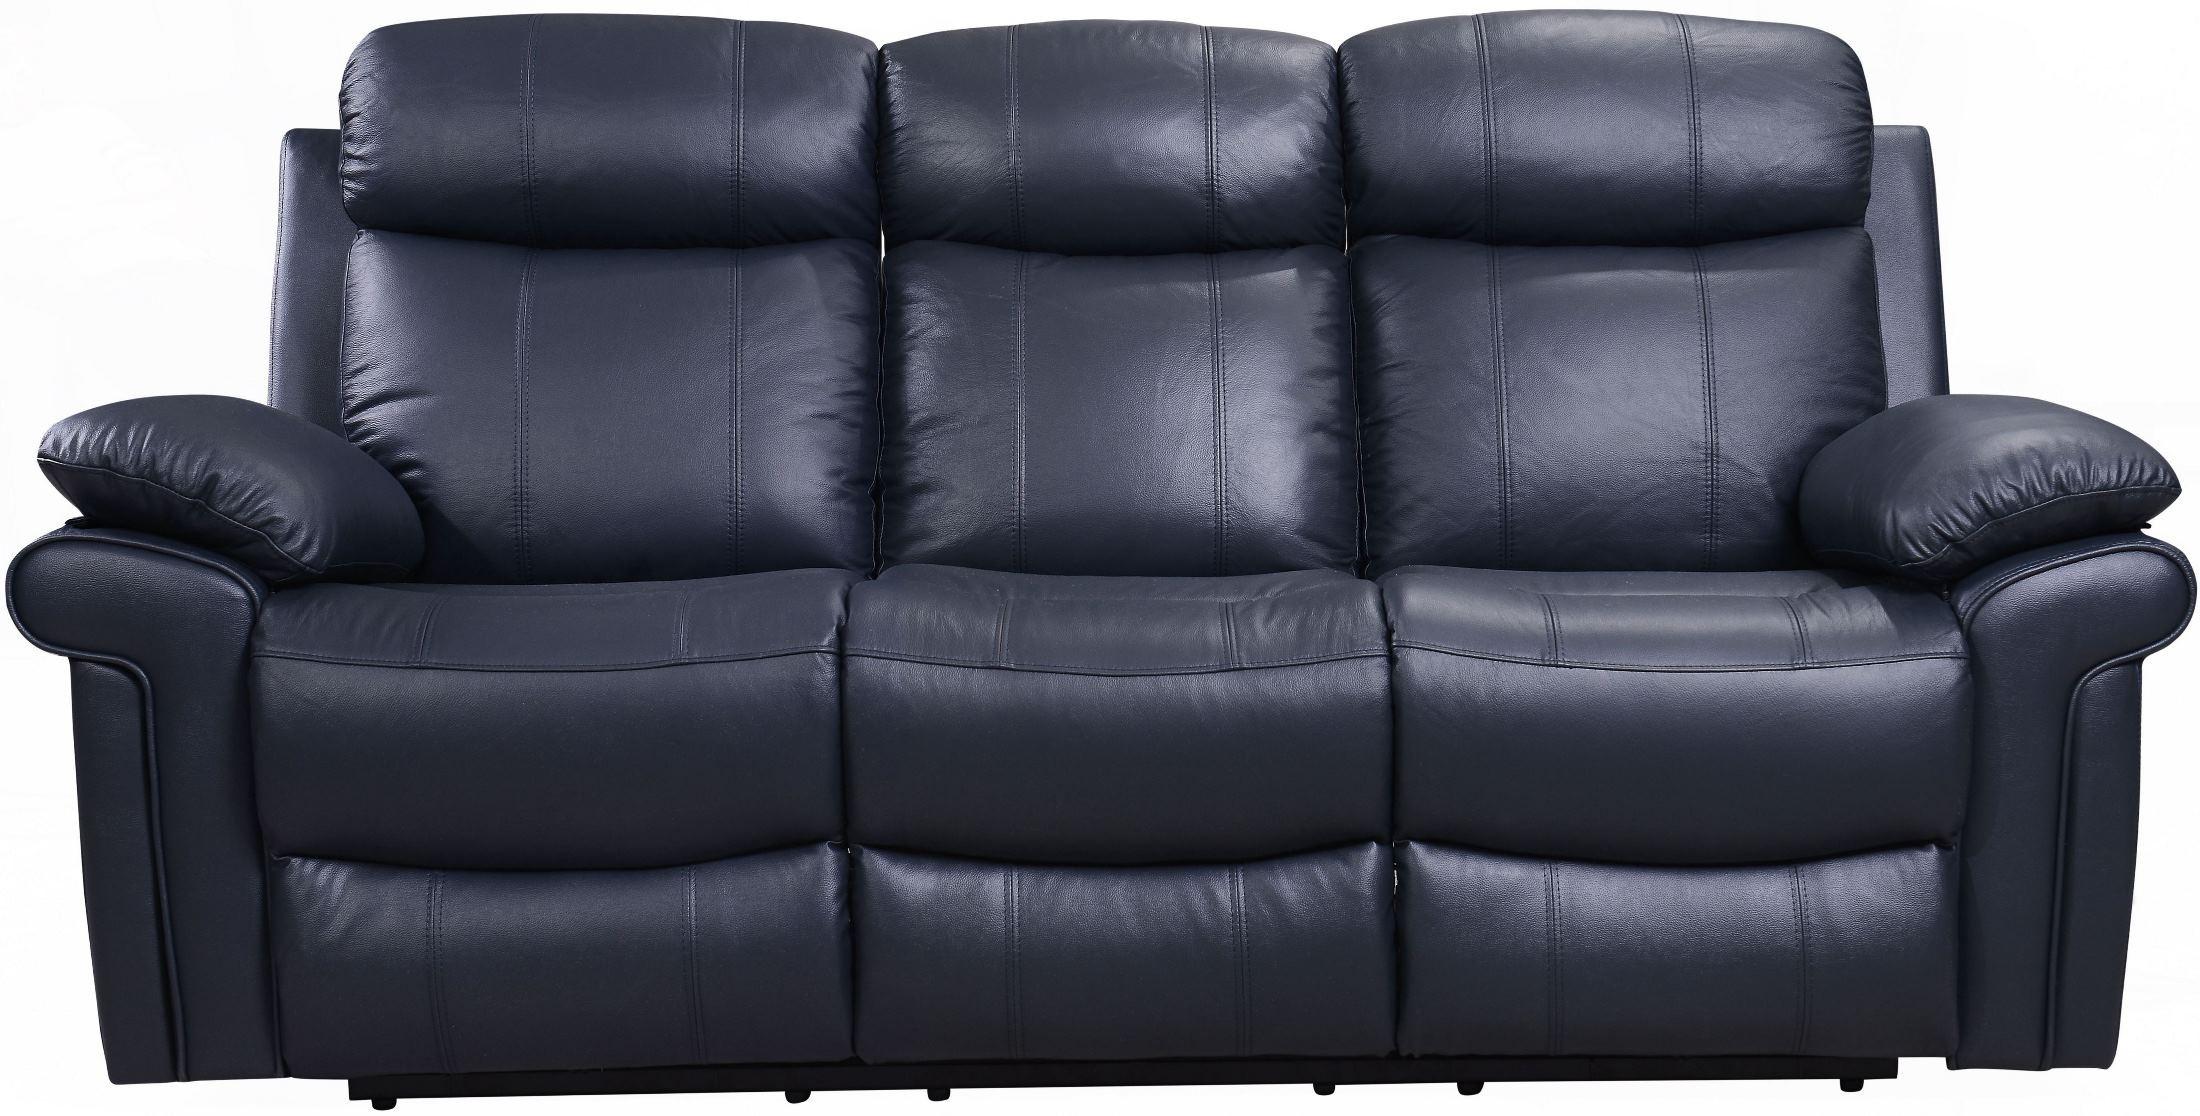 Shae Joplin Blue Leather Power Reclining Sofa 1555 E2117